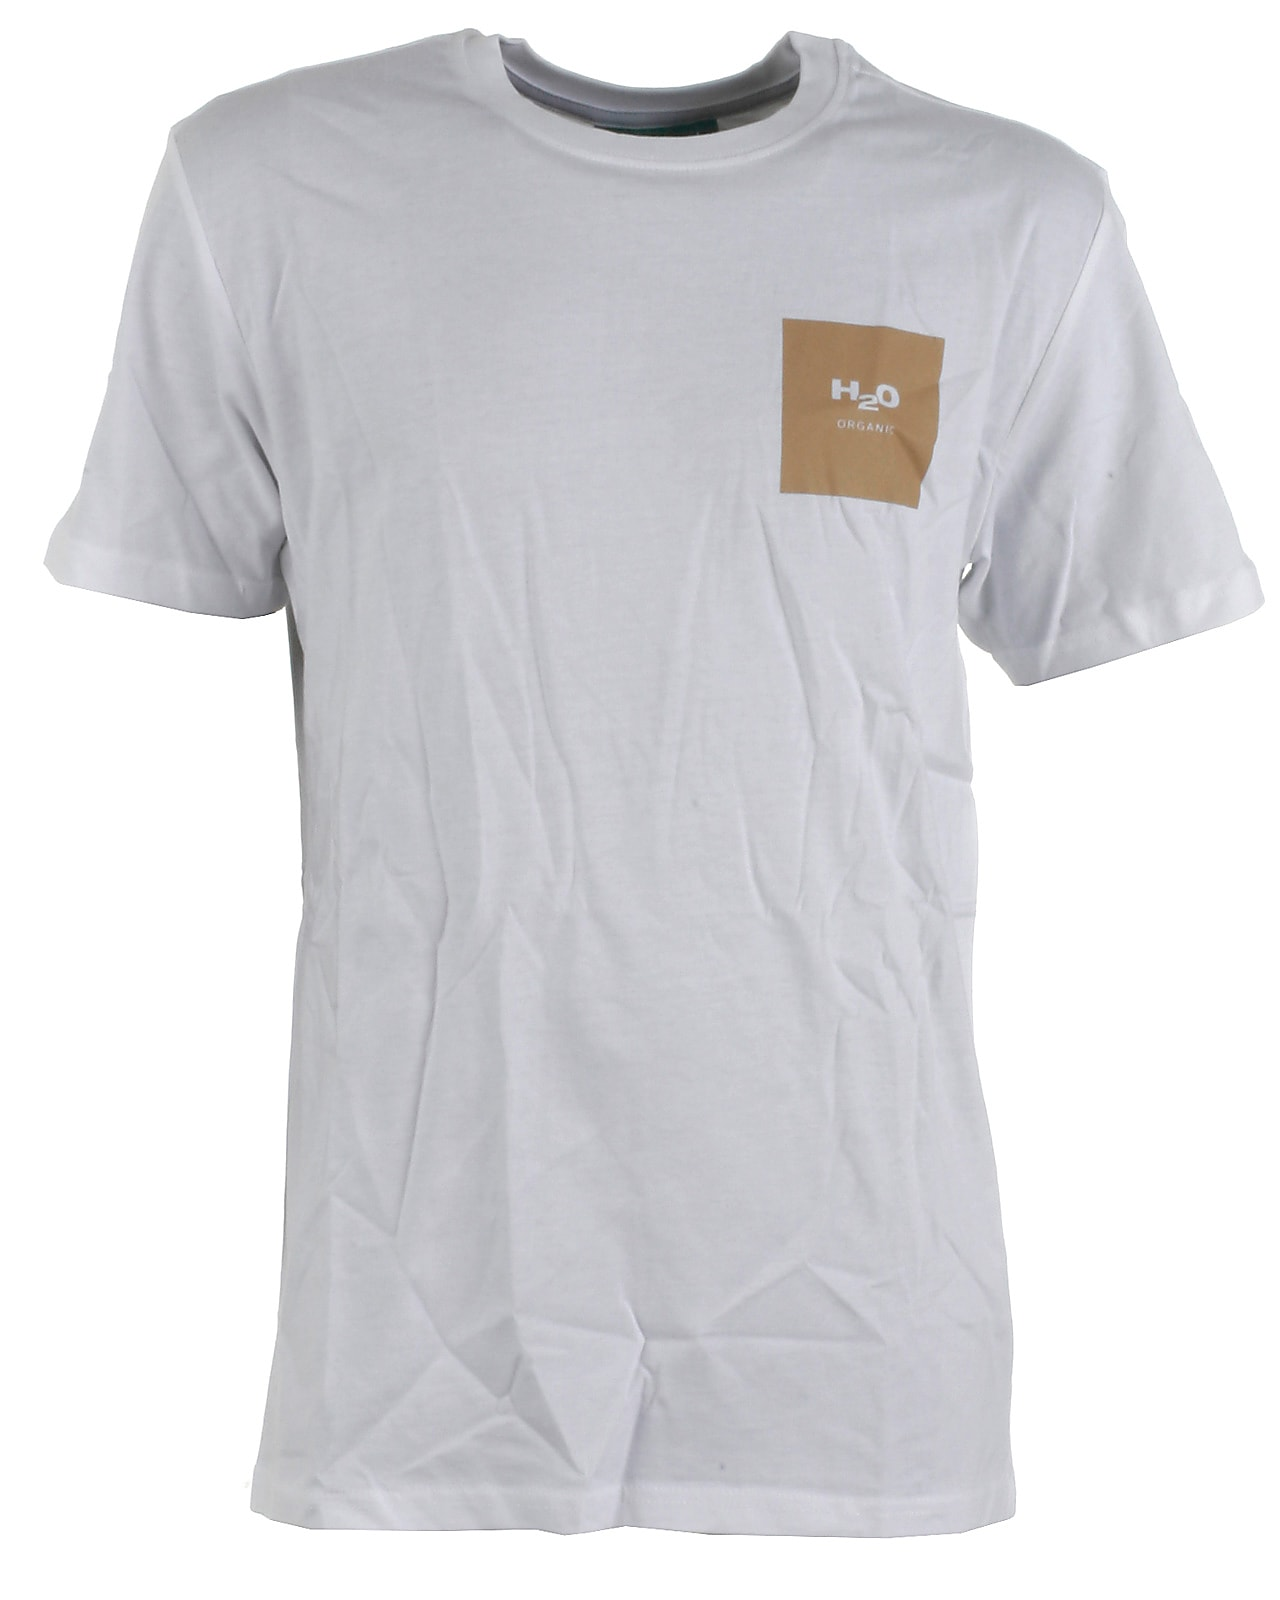 Image of H2O t-shirt s/s, Lyø, whitesand